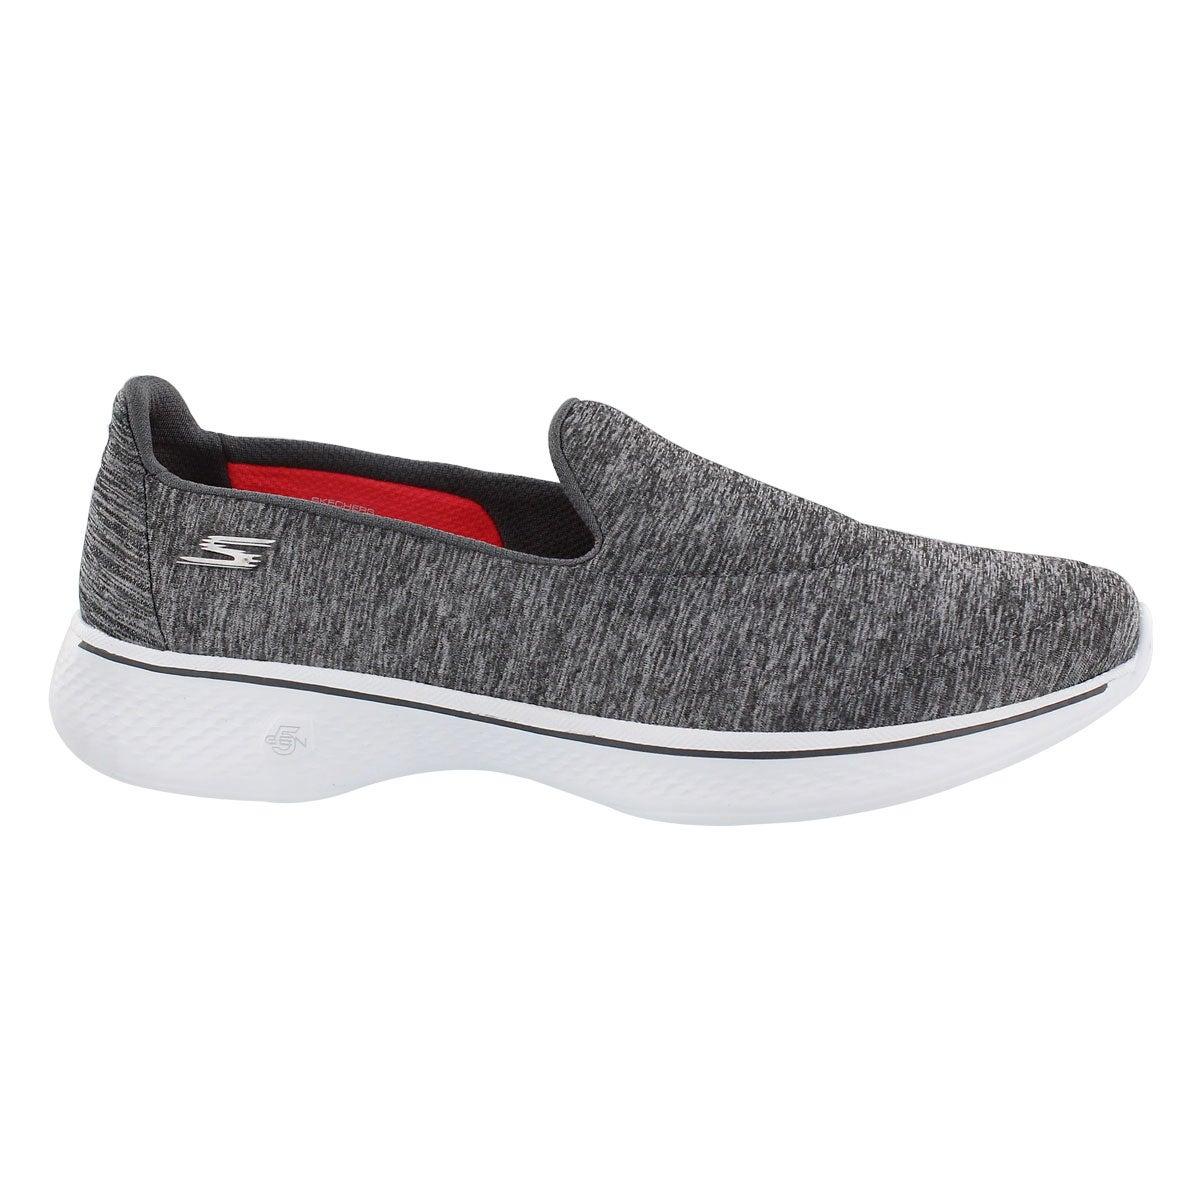 Lds GOwalk 4 Achiever gry slip on shoe